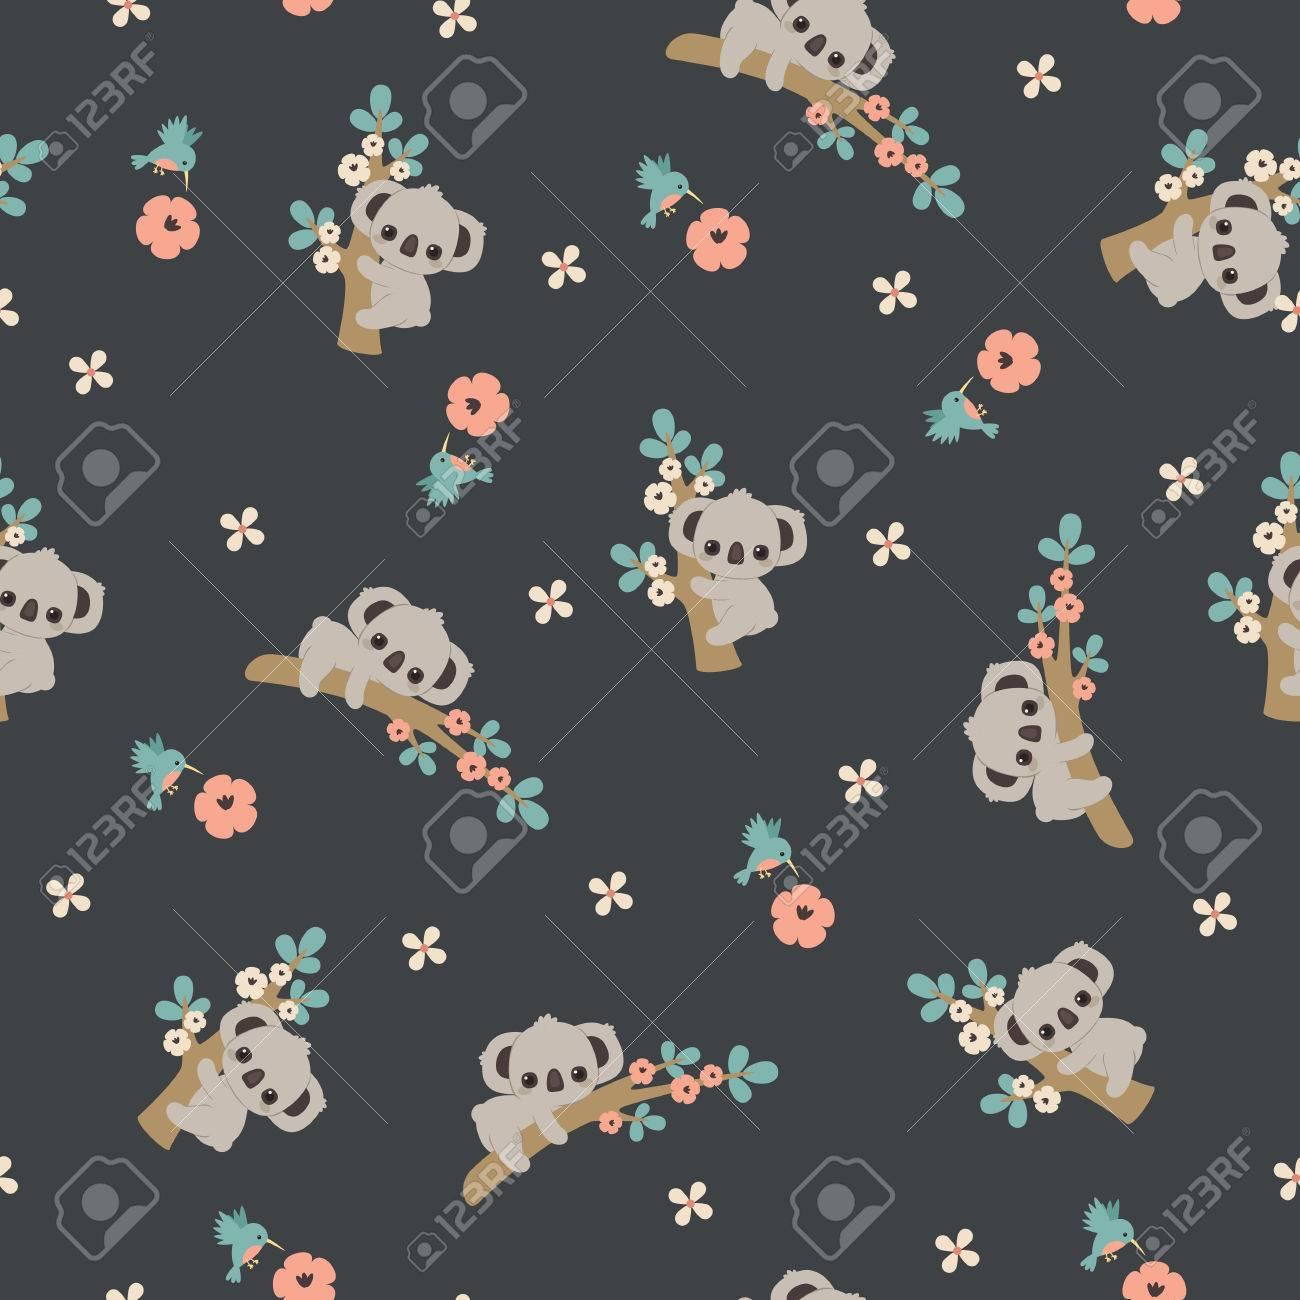 Top Wallpaper Koala Cartoon - 84360453-cute-cartoon-koala-floral-seamless-pattern-wallpaper  Best Photo Reference_775832   .jpg